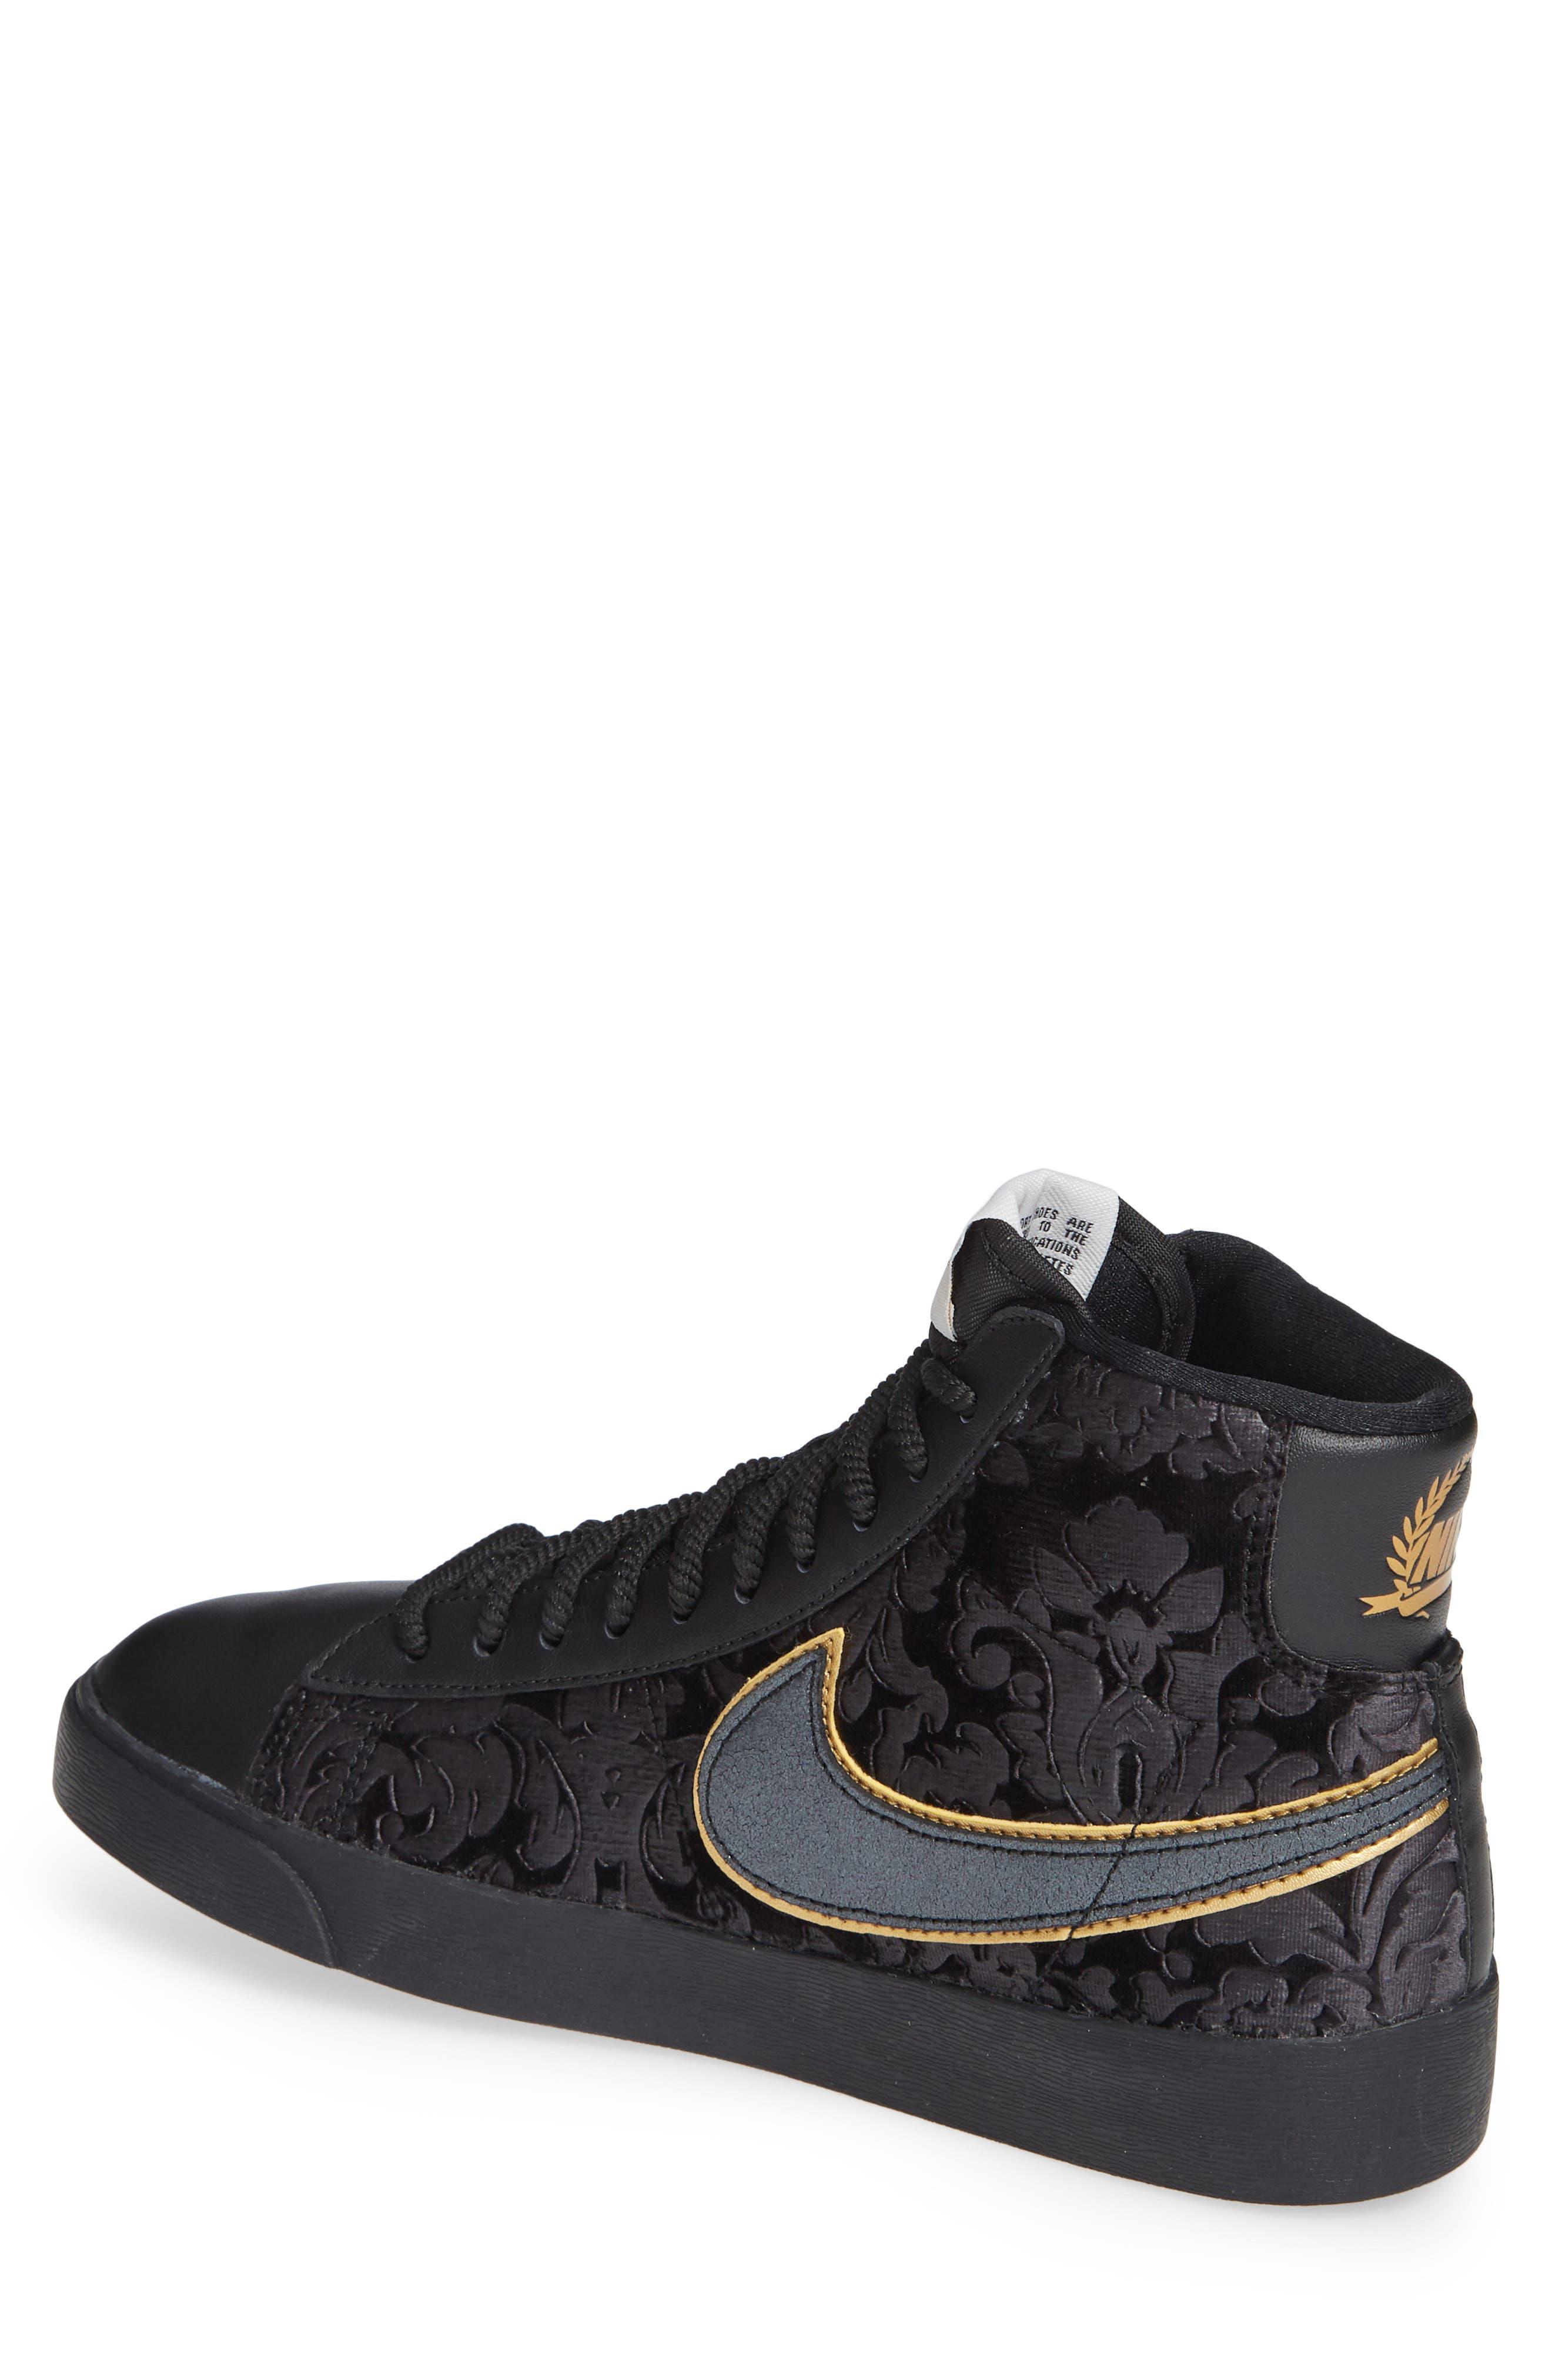 NIKE, Blazer Mid Top Sneaker, Alternate thumbnail 2, color, BLACK/ GOLD/ SUMMIT WHITE